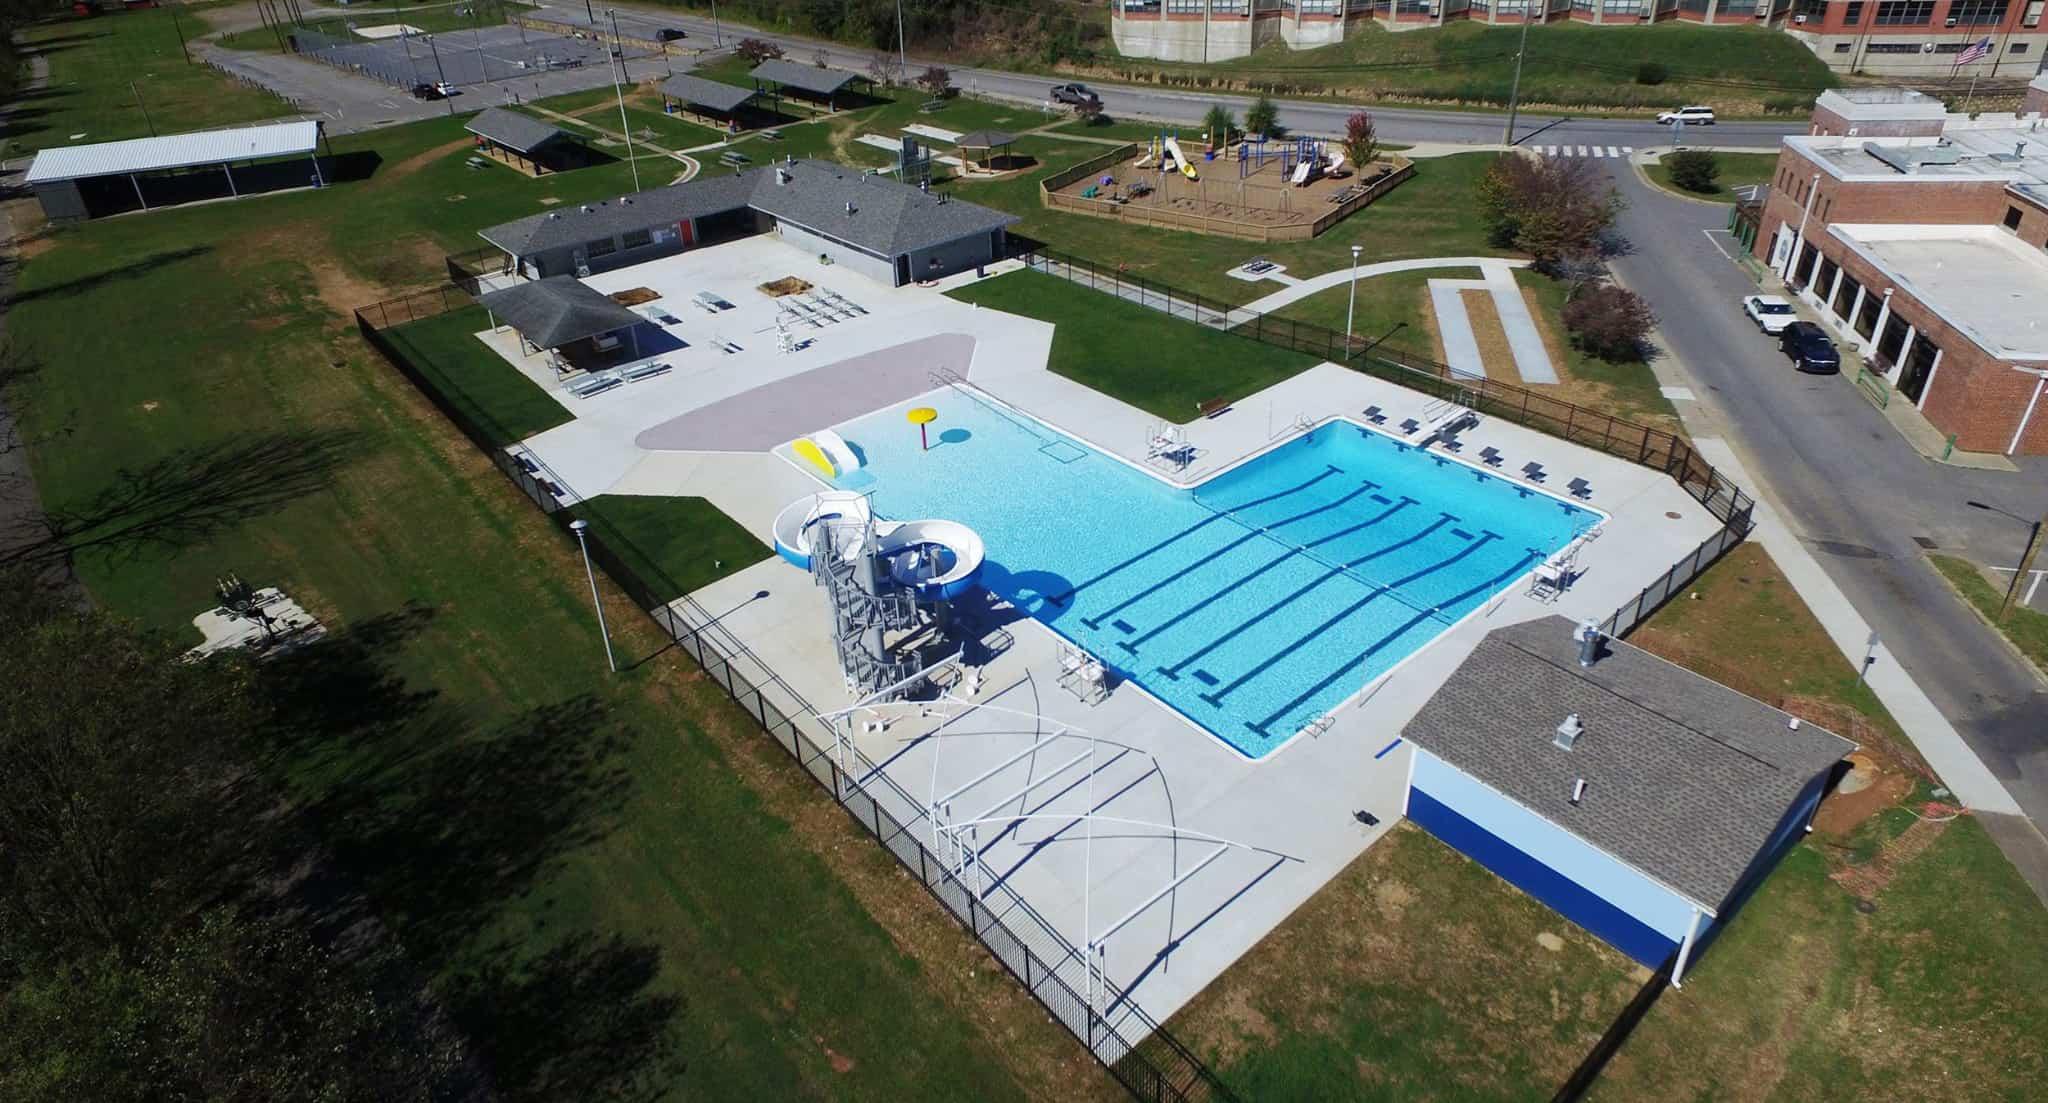 Canton Recreation Park Pool